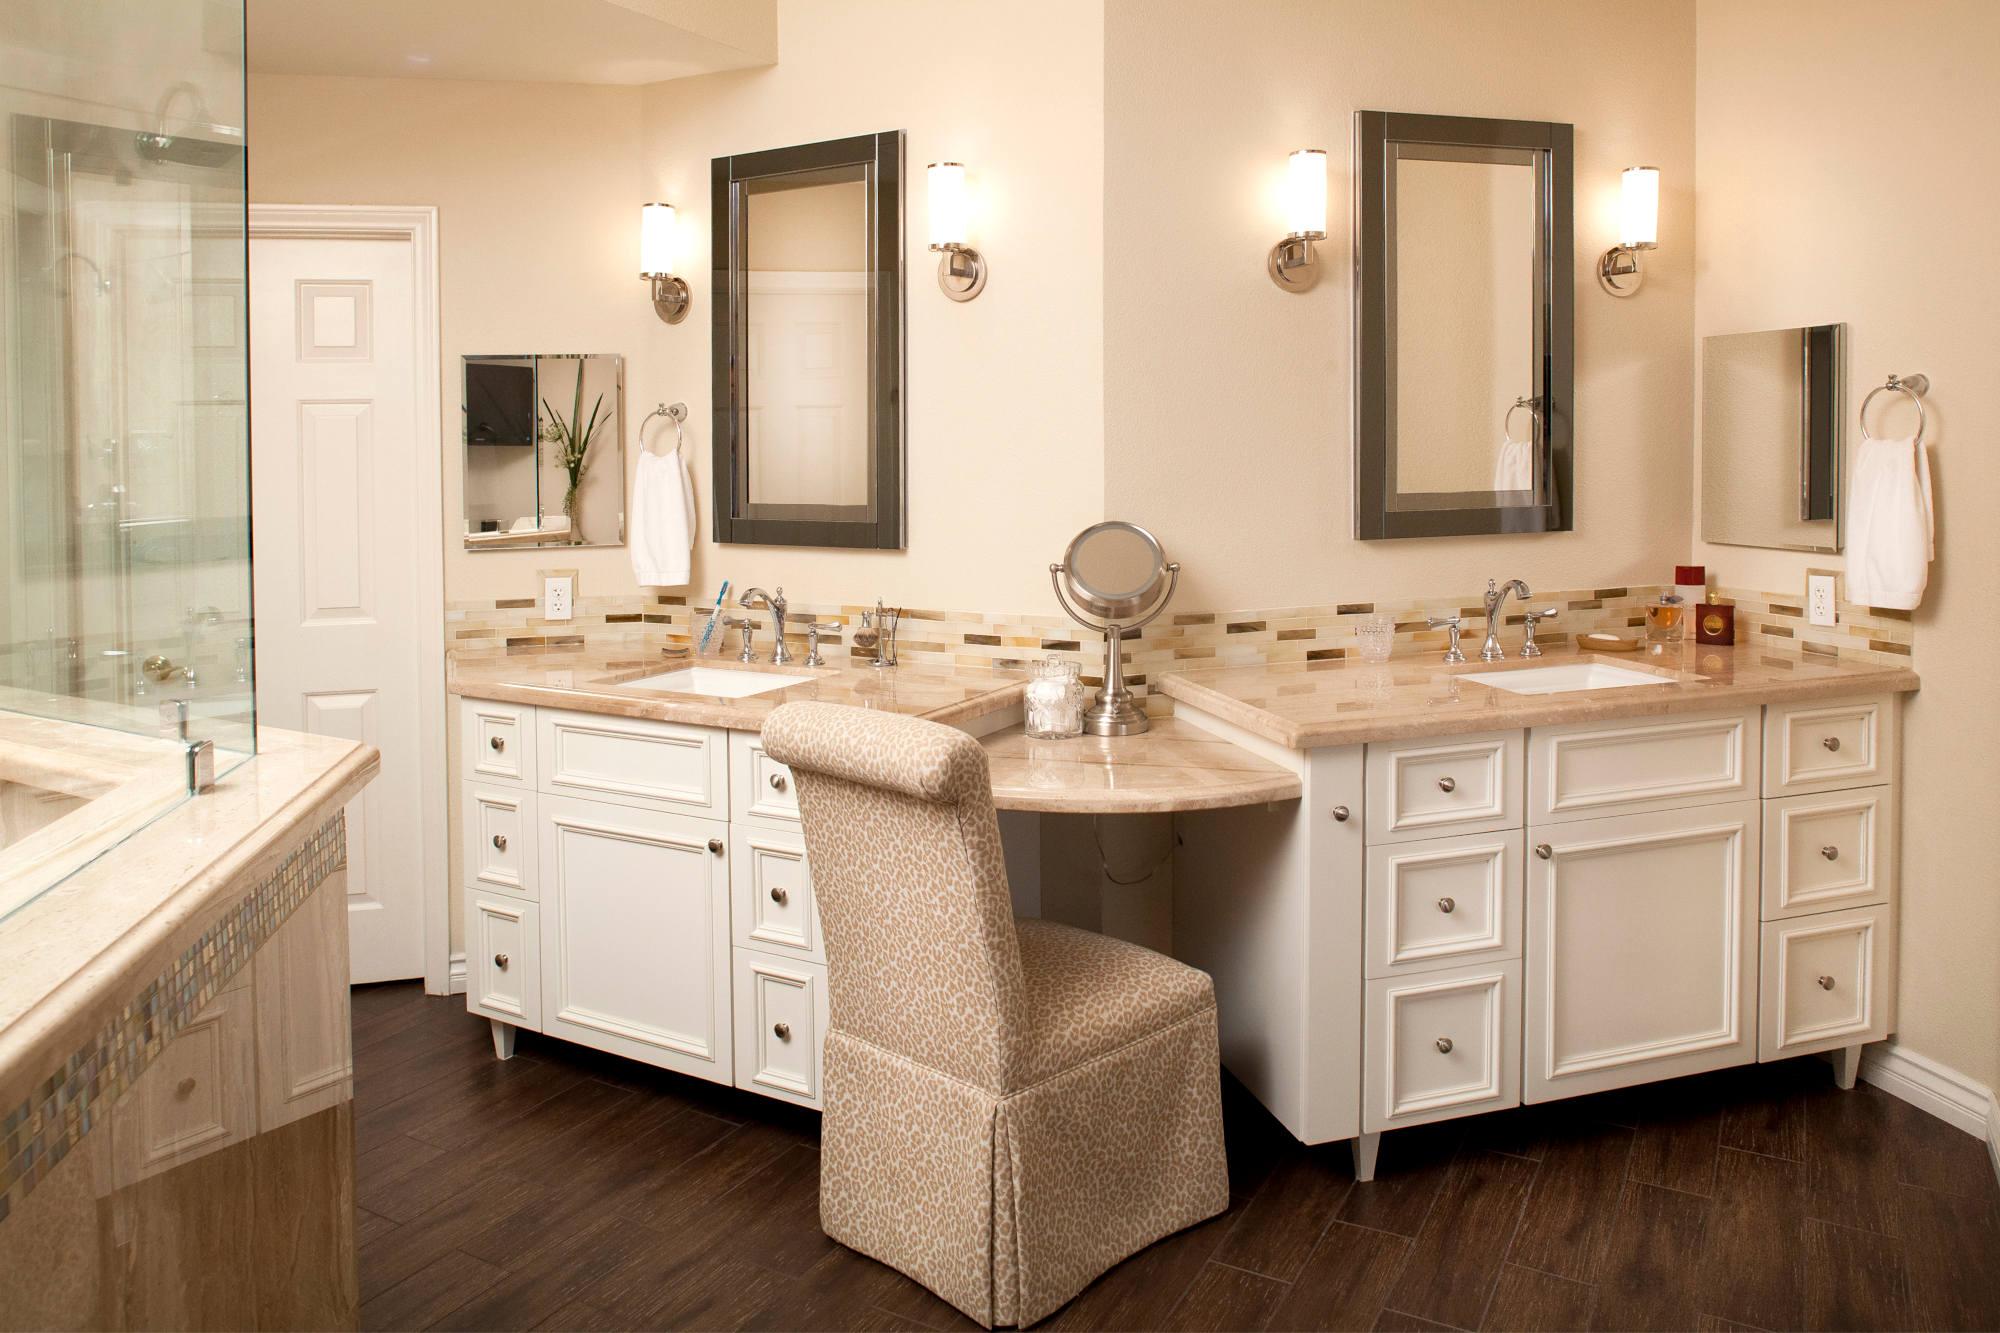 Traditional master bath with white vanities, marble countertops, glass backsplash, wood tile floor.